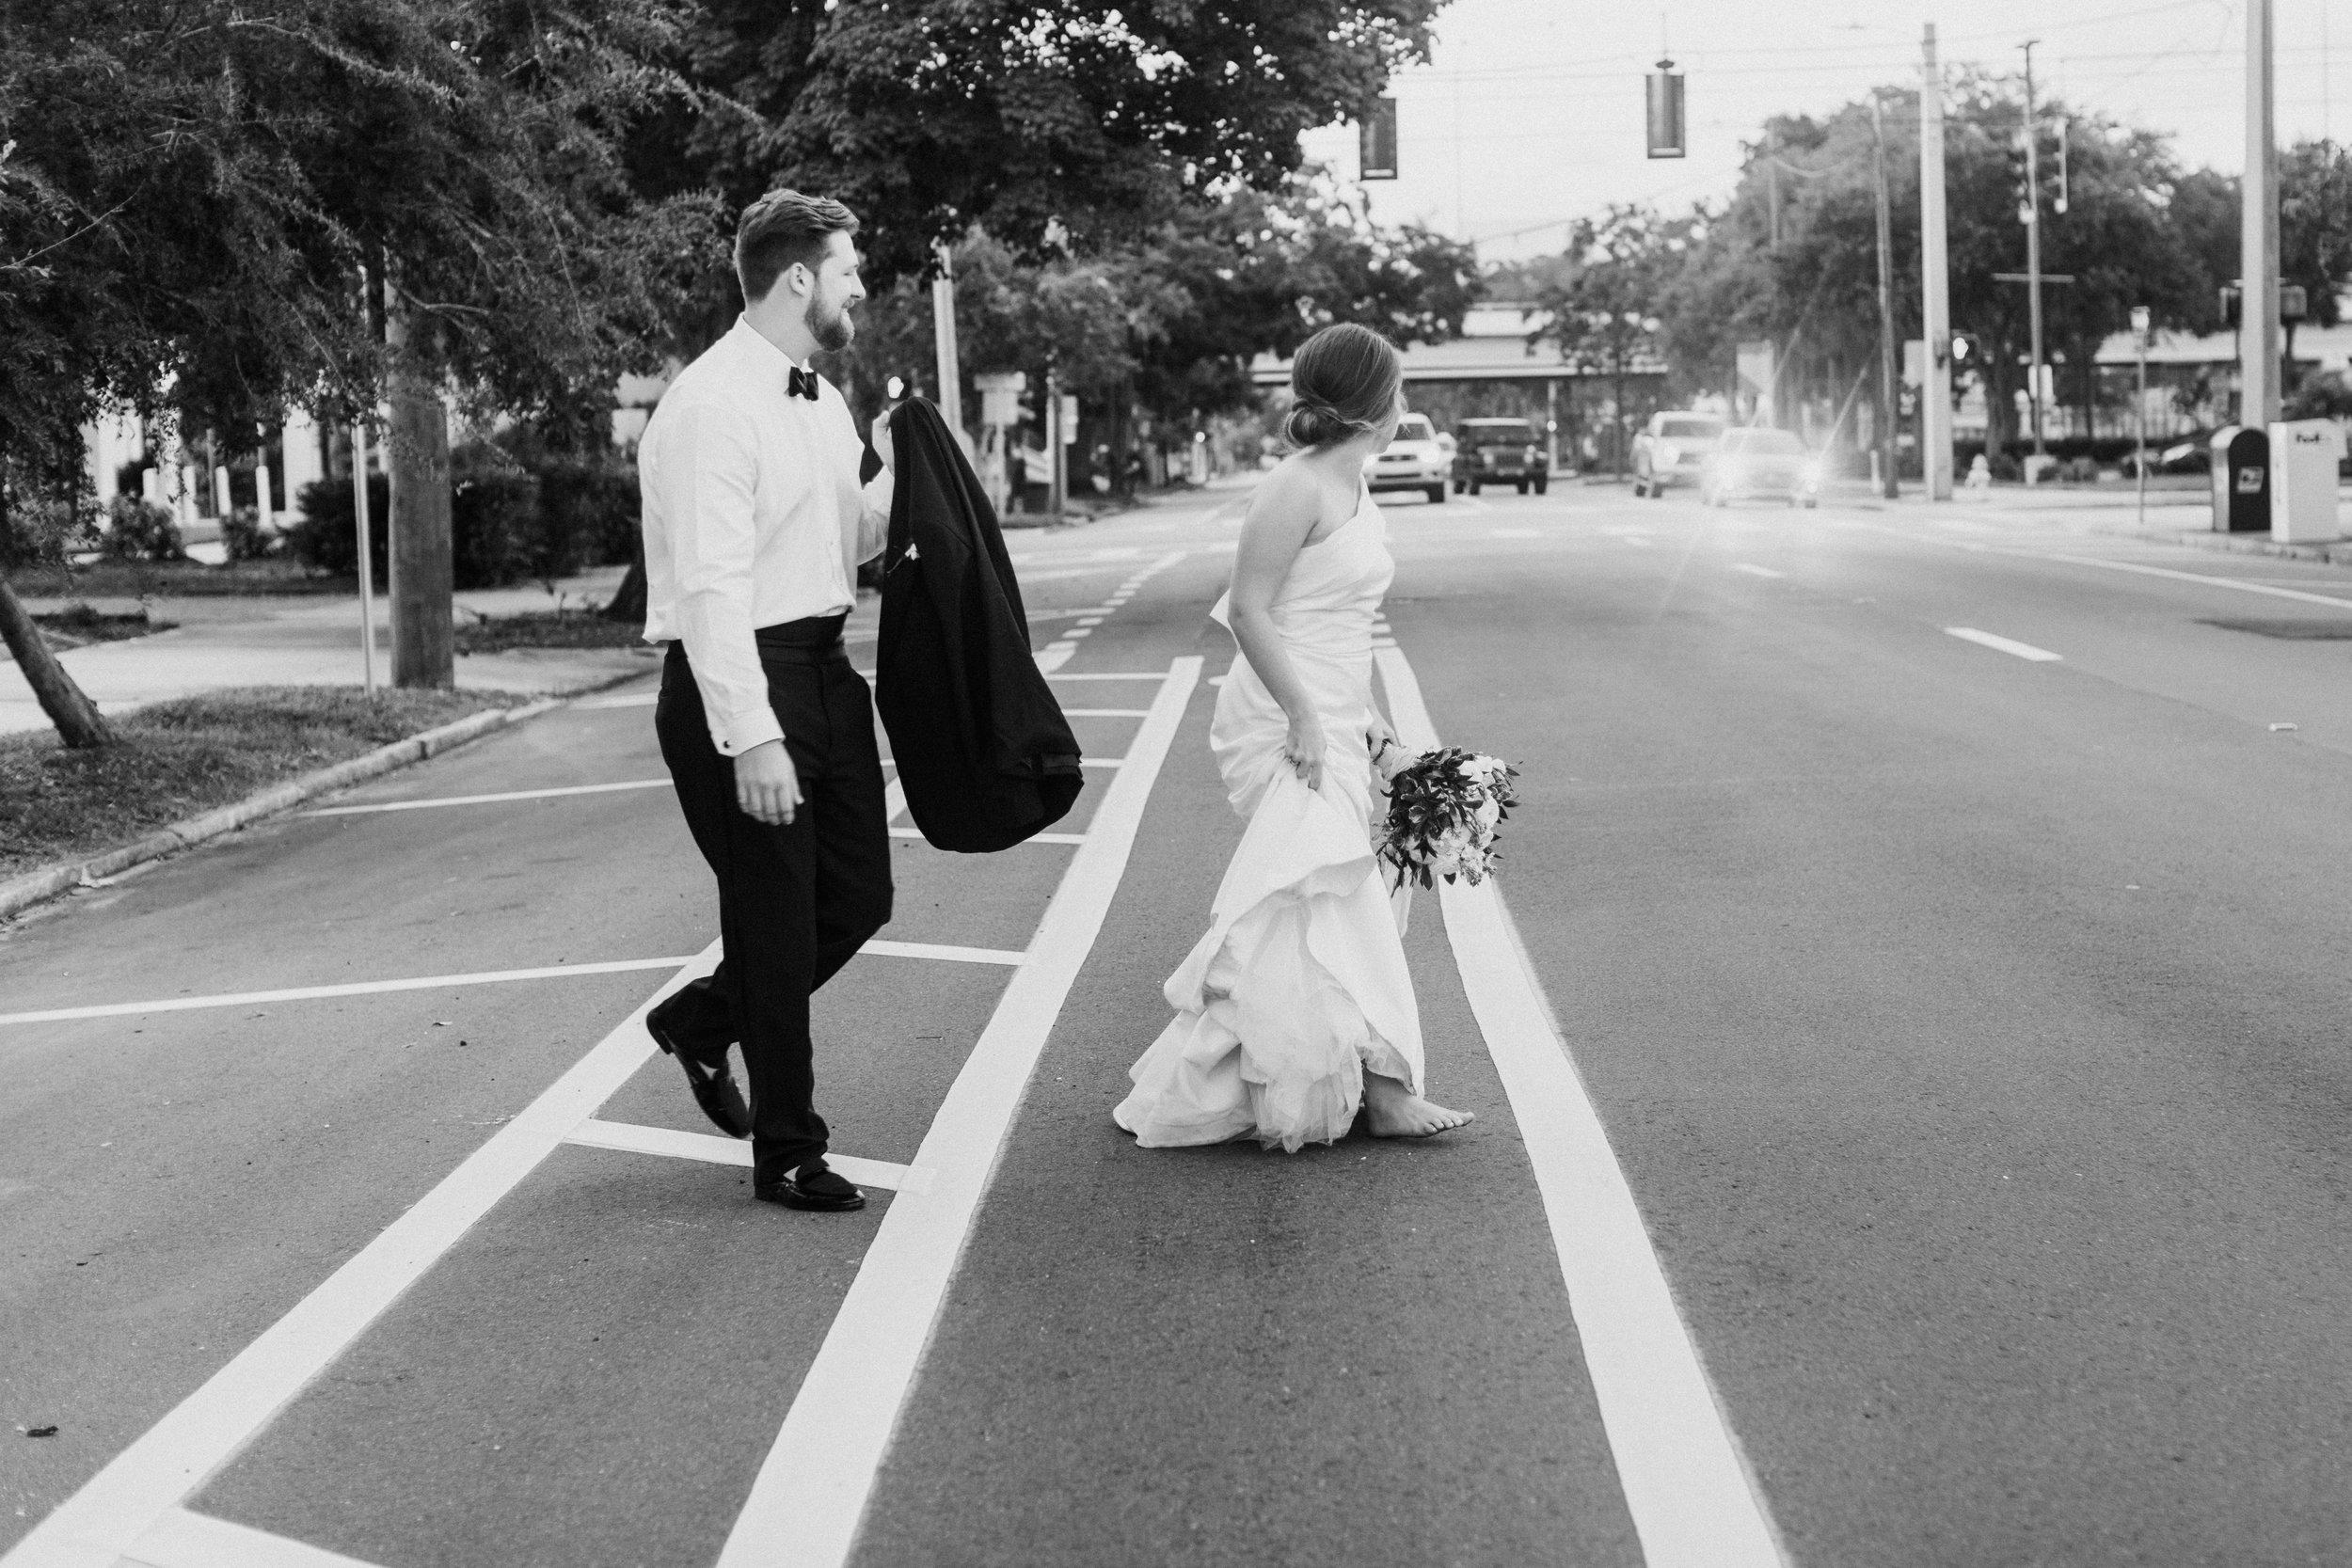 barefoot bride crossing the street